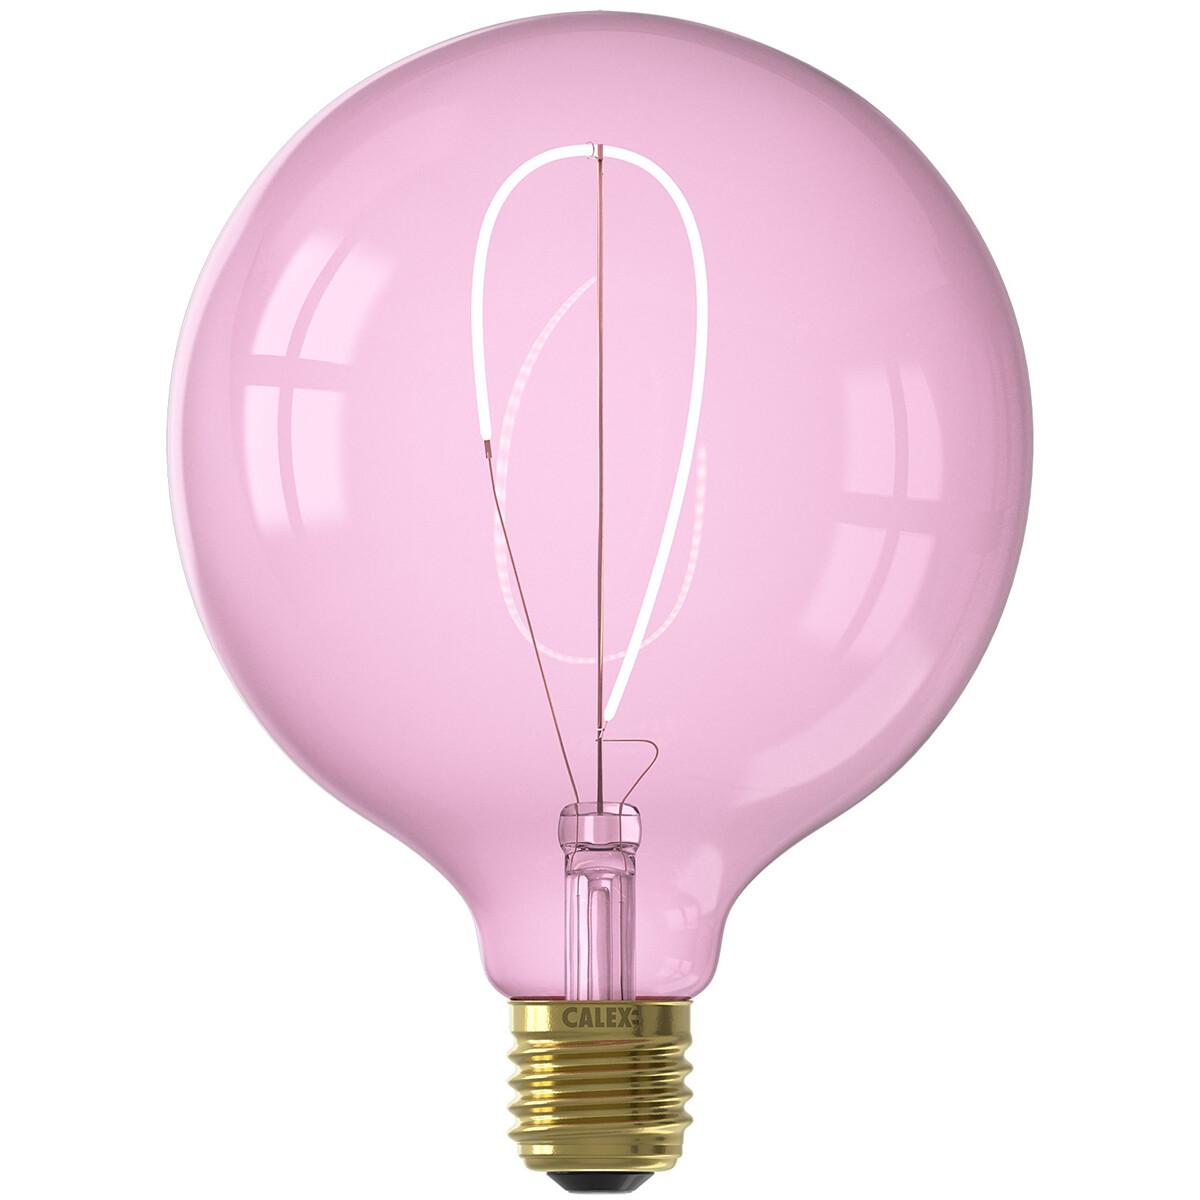 Calex NORA LED Globe G125 E27 4W roze dimbaar